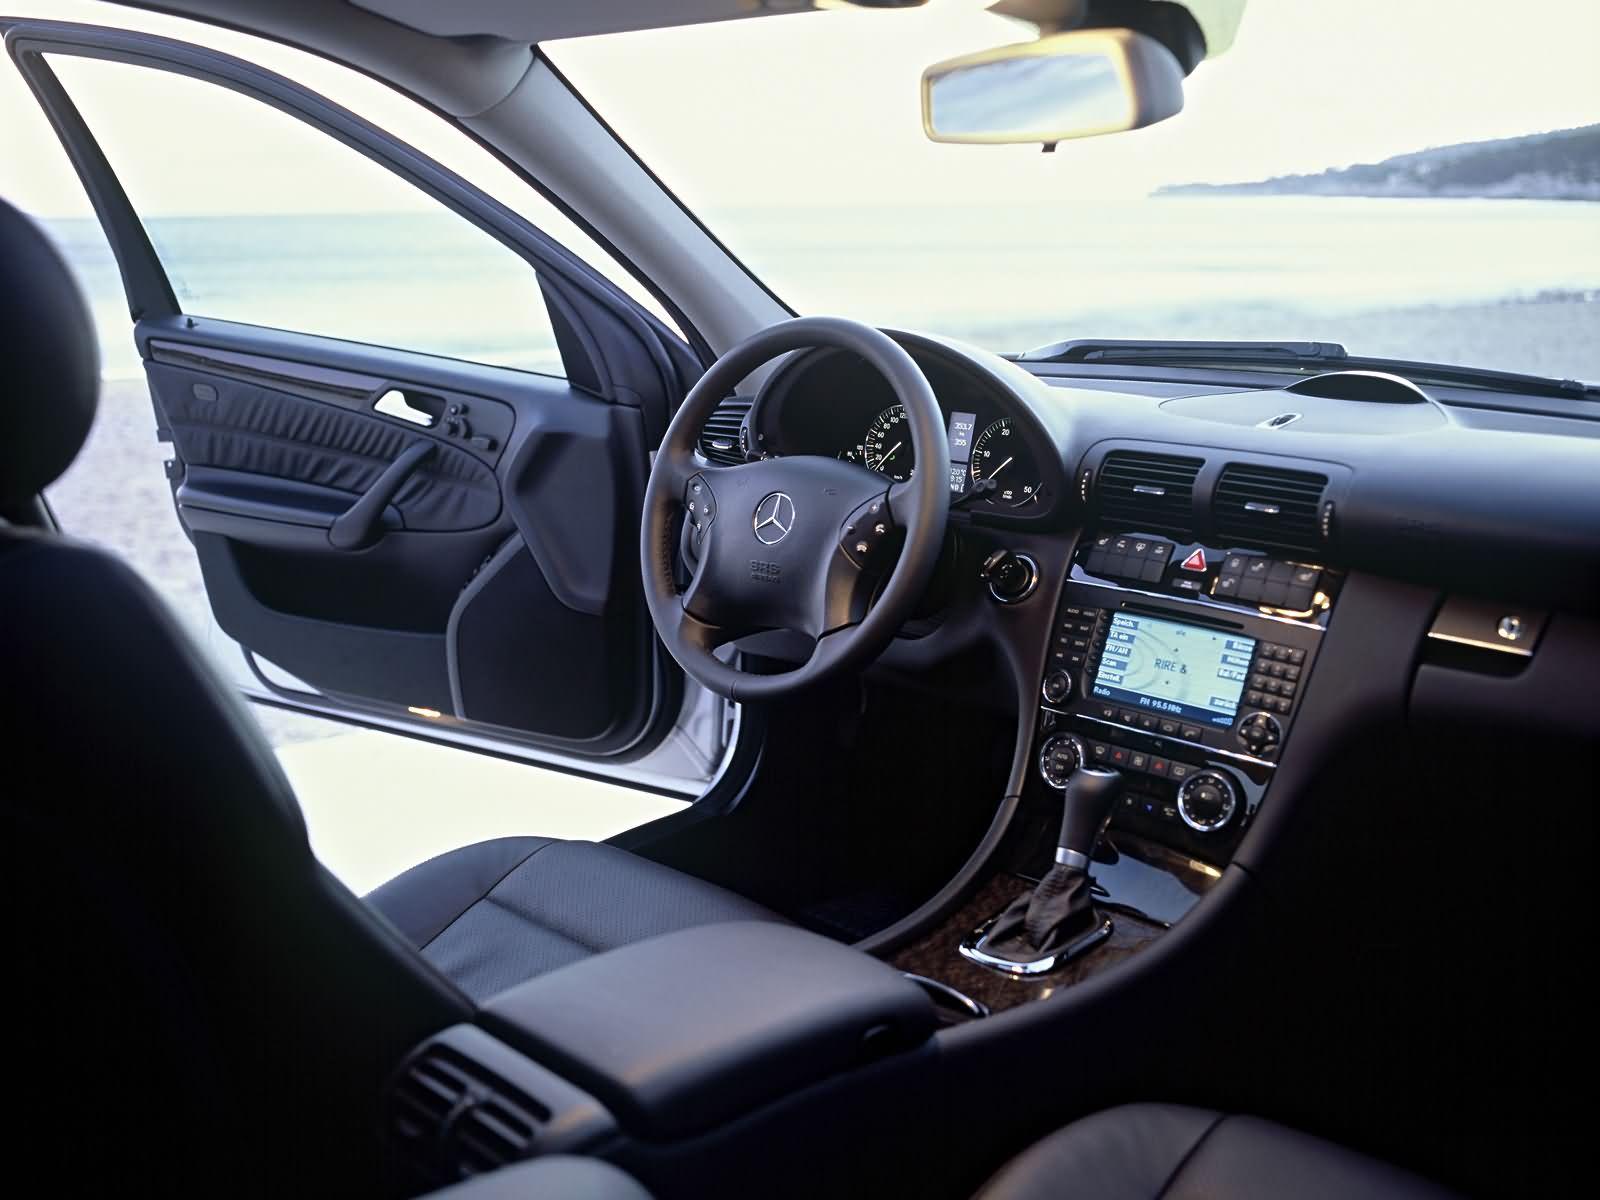 Mercedes Benz E Owners Manual Pdf